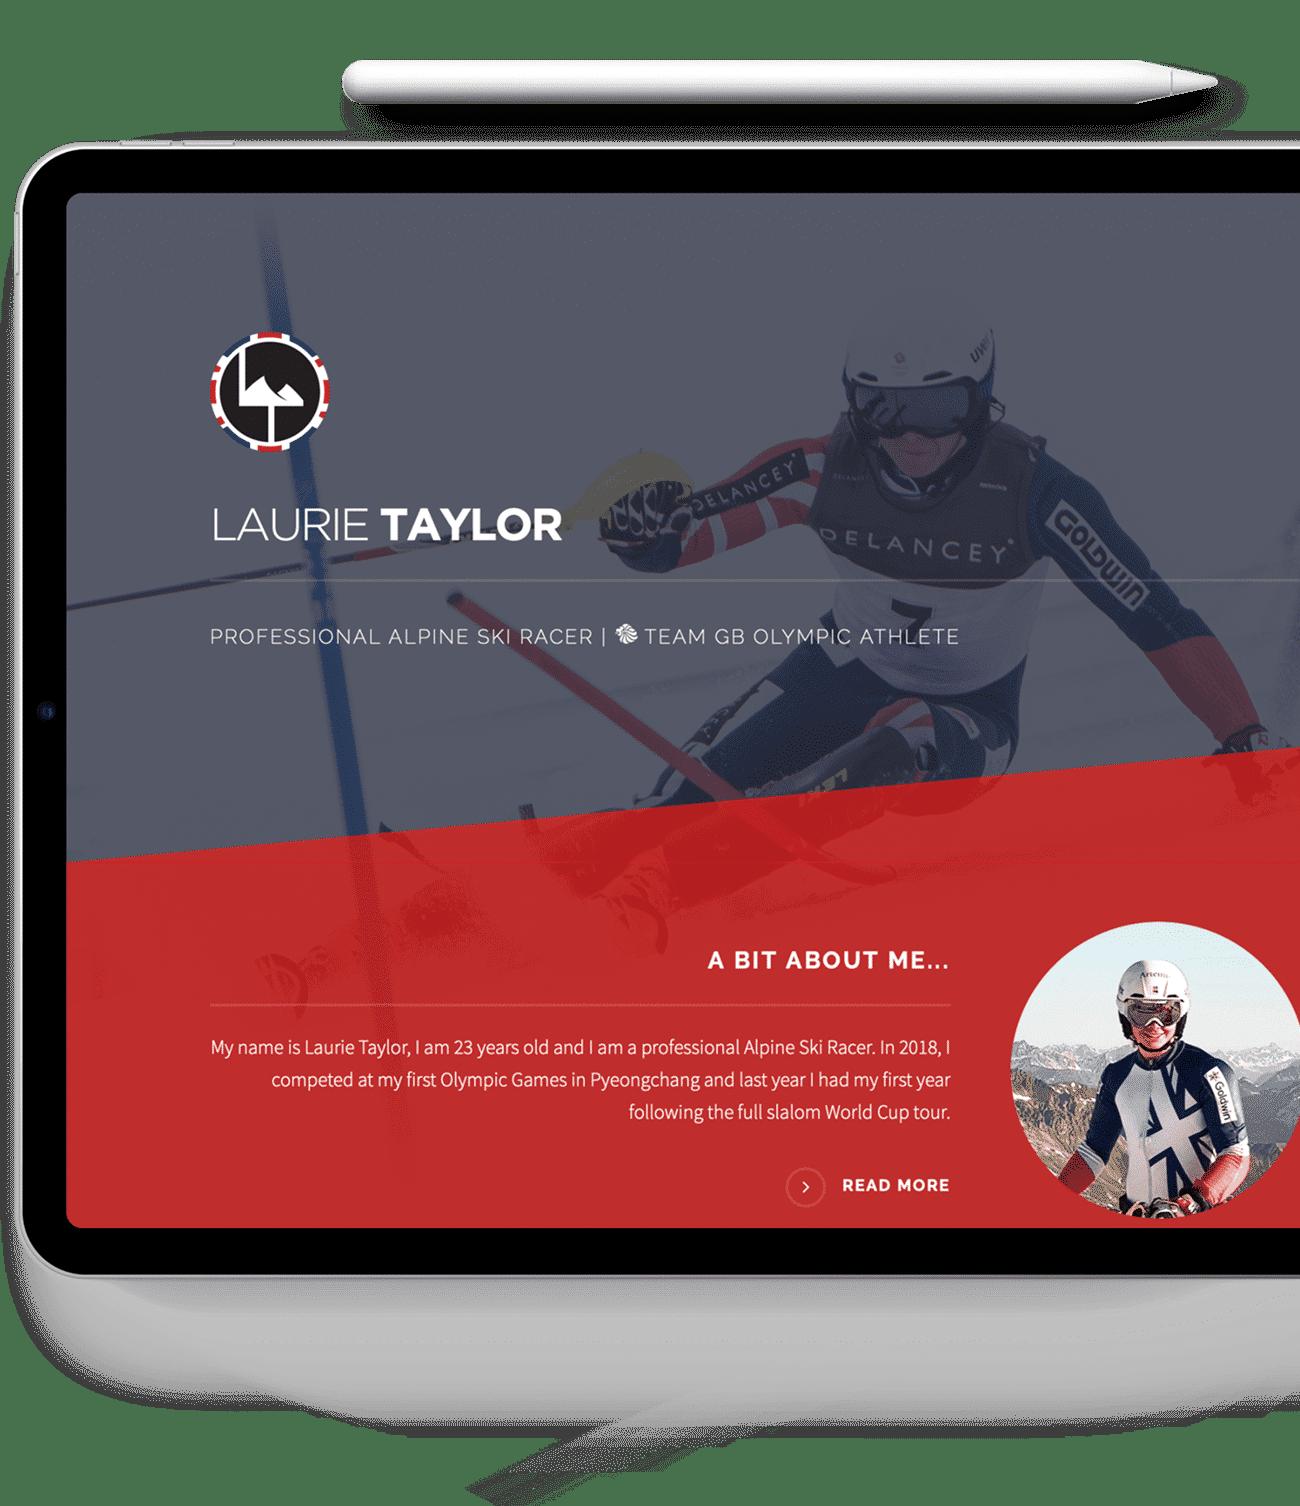 Laurie Taylor Website Design